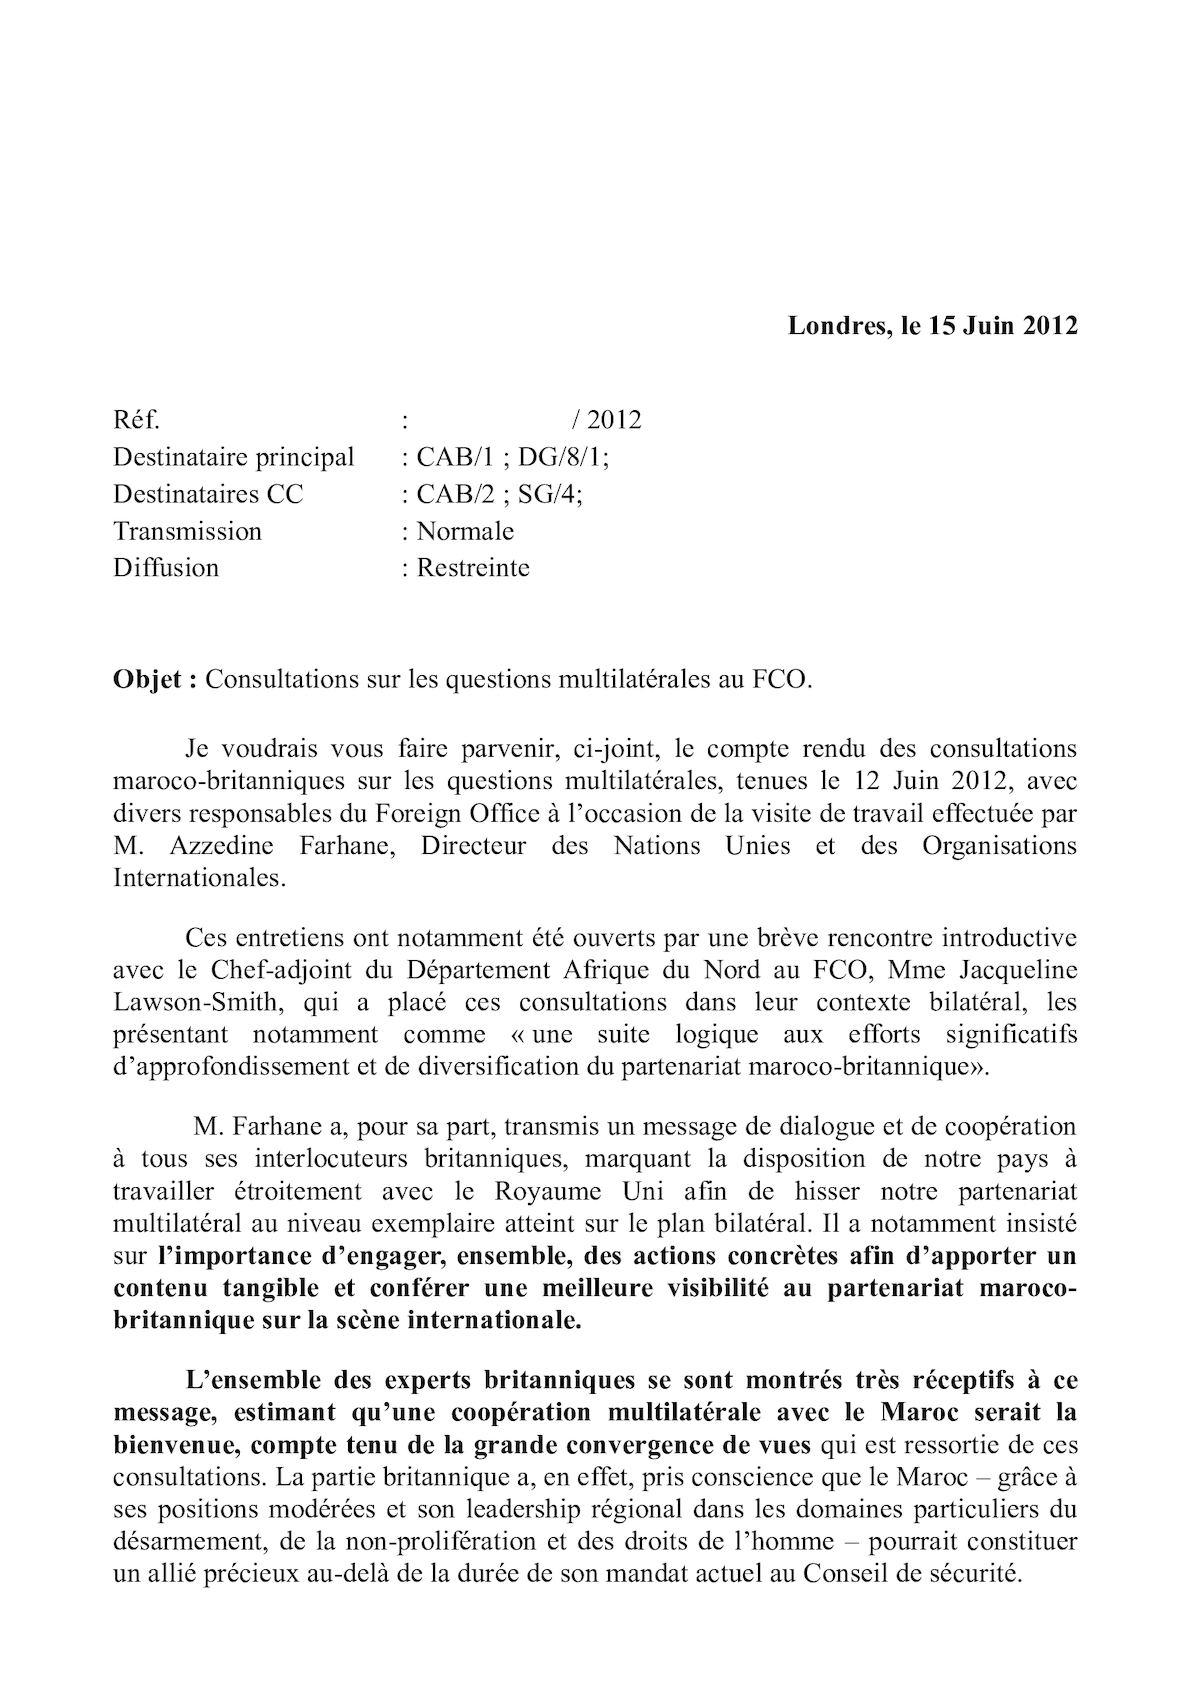 Transmission Consultations Mr Farhane - 12 Juin 2012